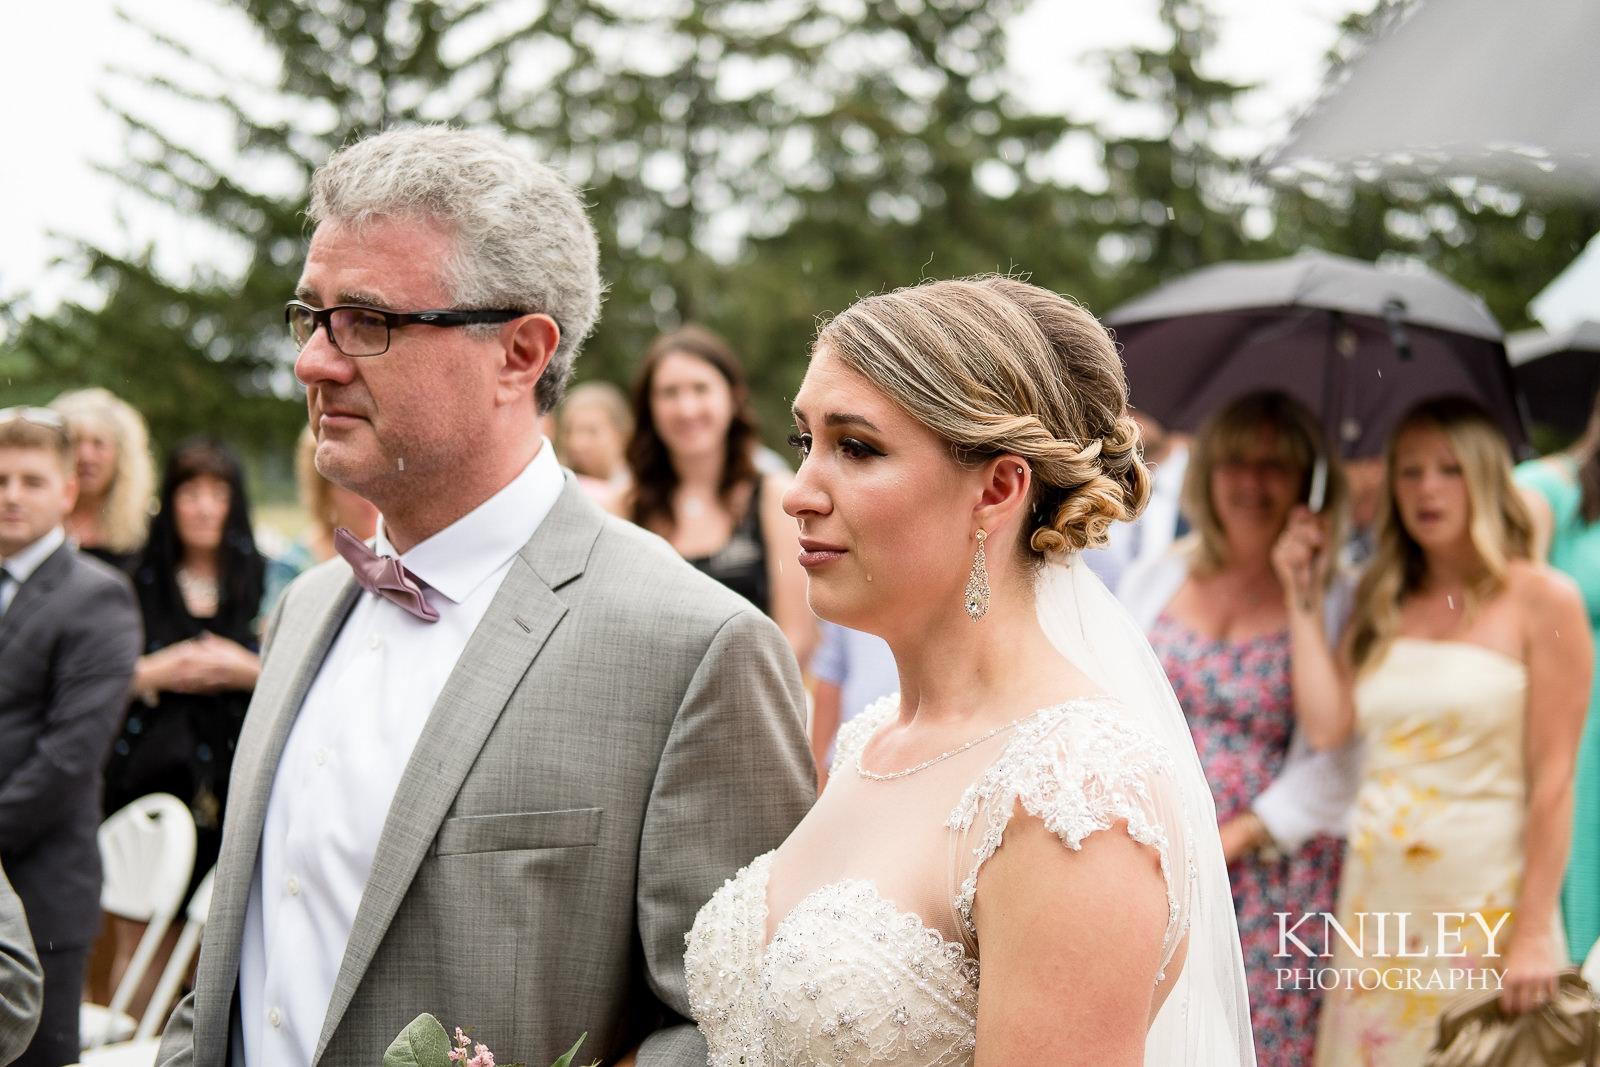 044 - Ontario Golf Club Wedding Pictures - XT2B8225.jpg